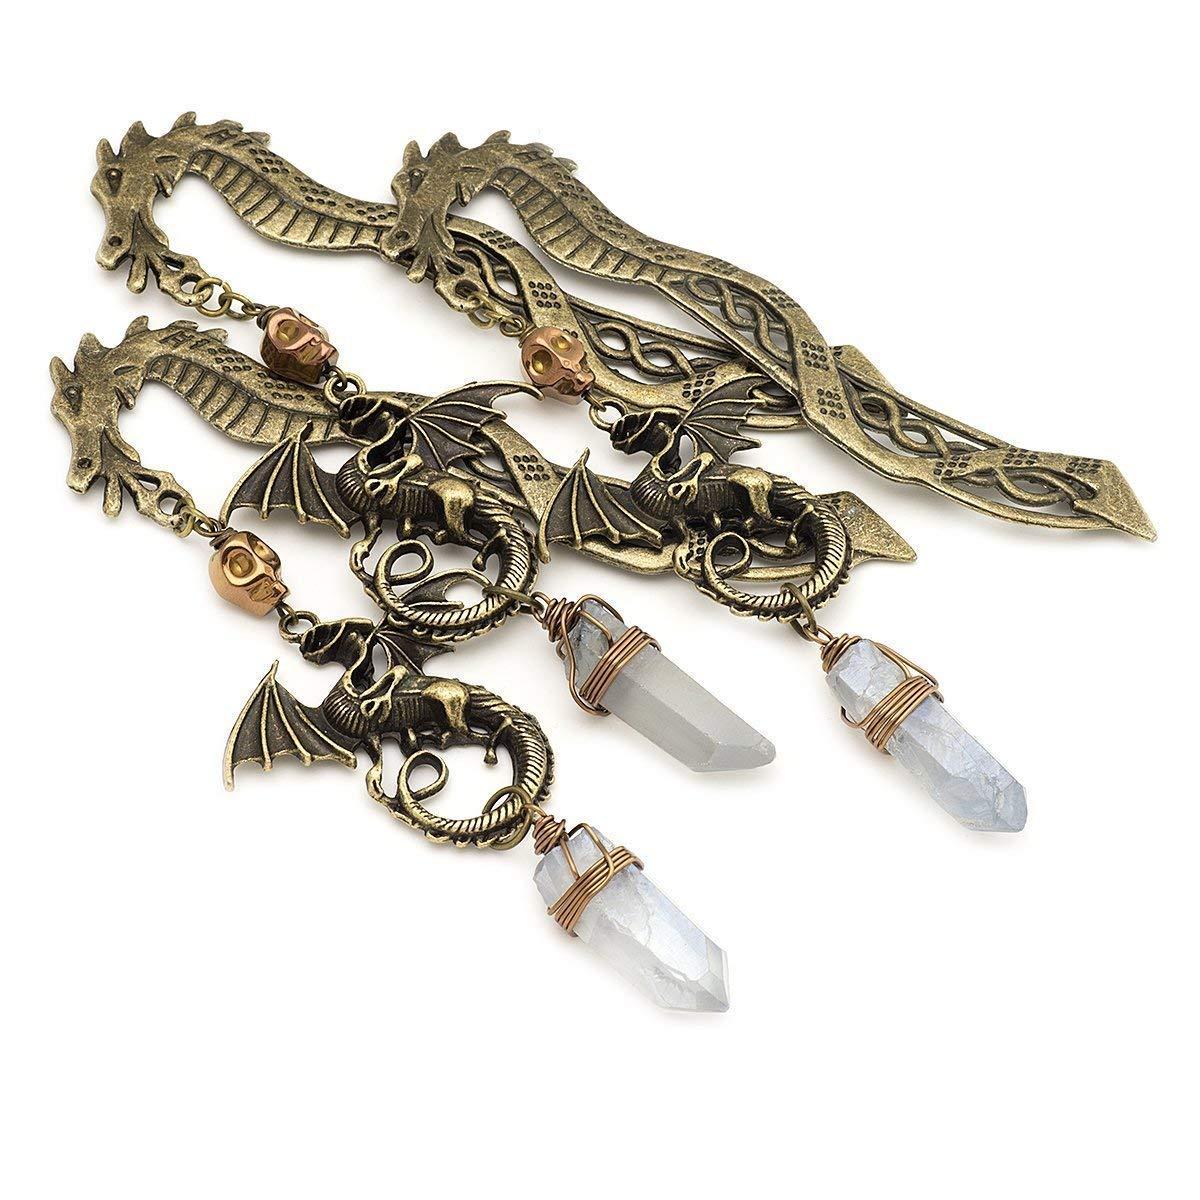 Storm Quartz Crystal Gemstone Point Dragon Bronze Metal Unique Bookmark 4.5 Inches